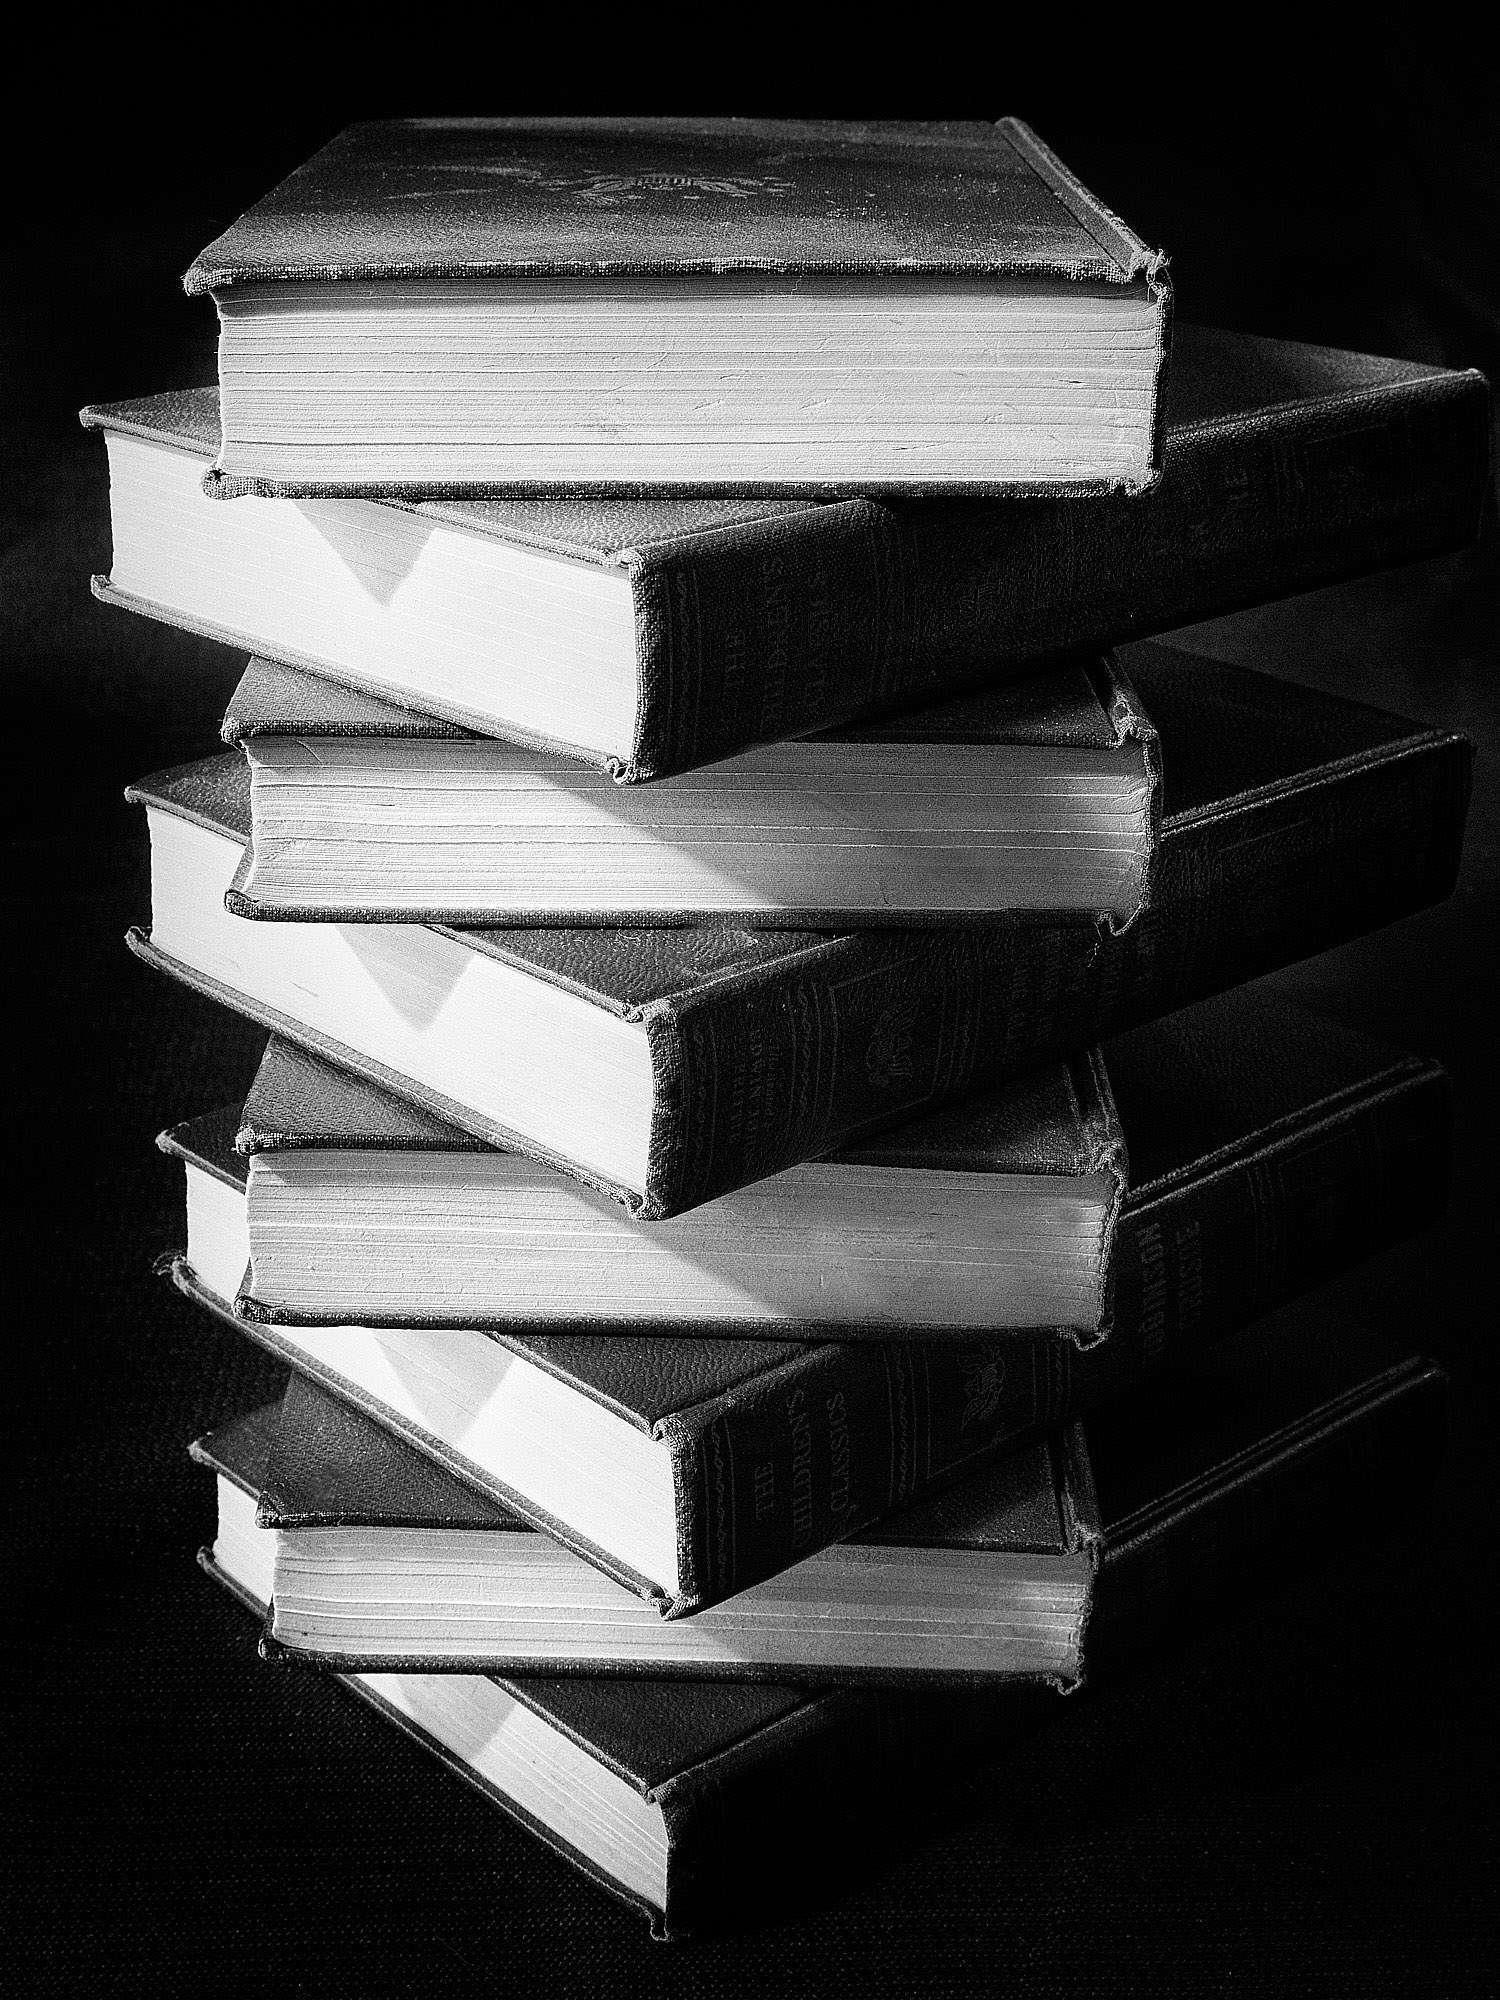 Walt Viney - Books (2nd Place)